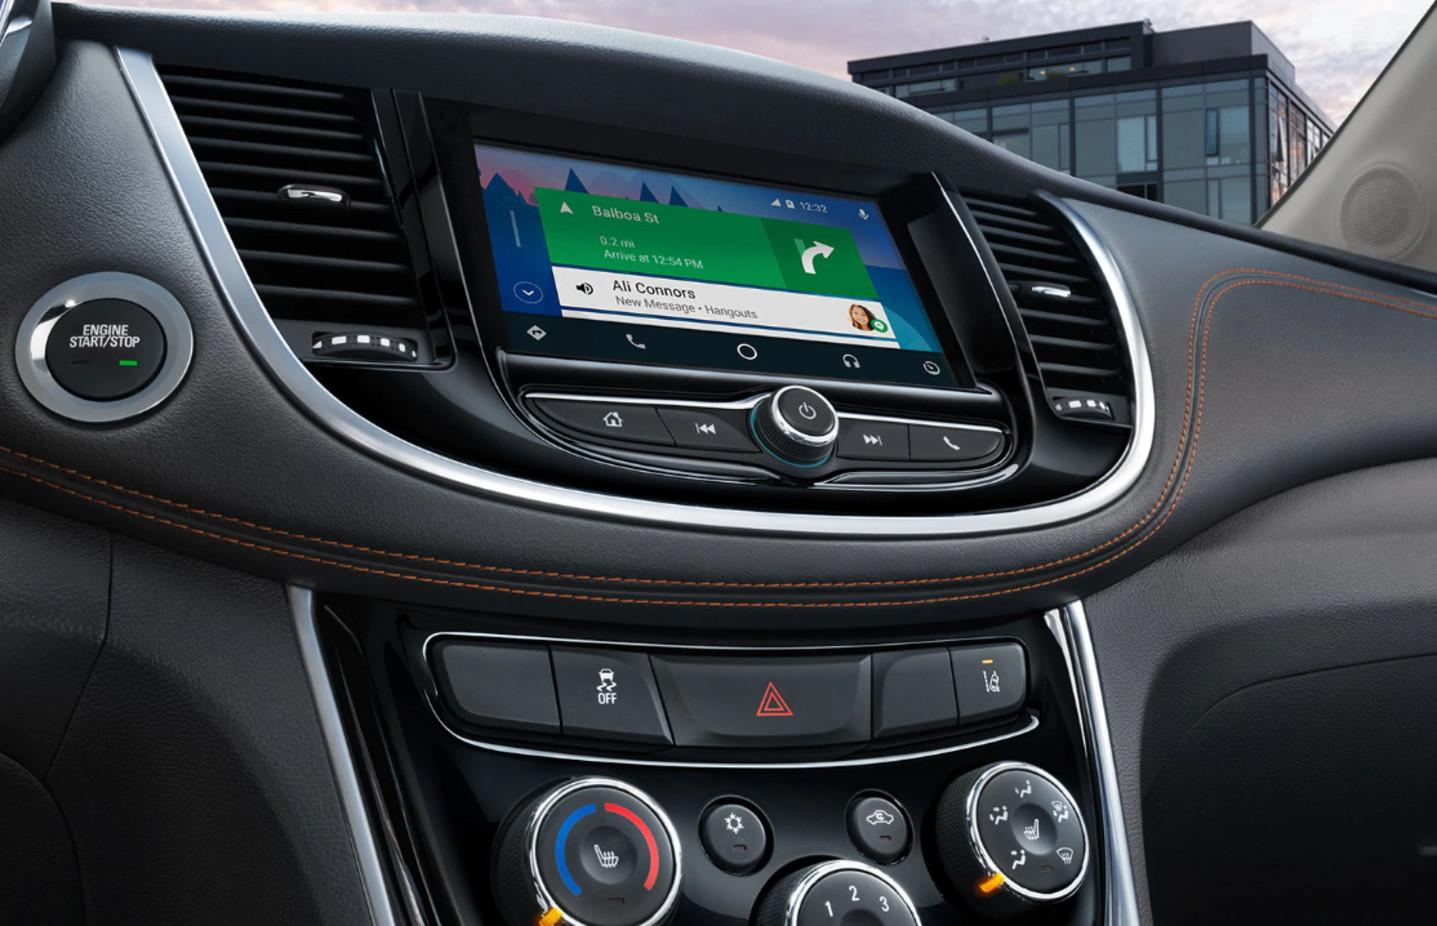 2020 Chevrolet Trax Infotainment